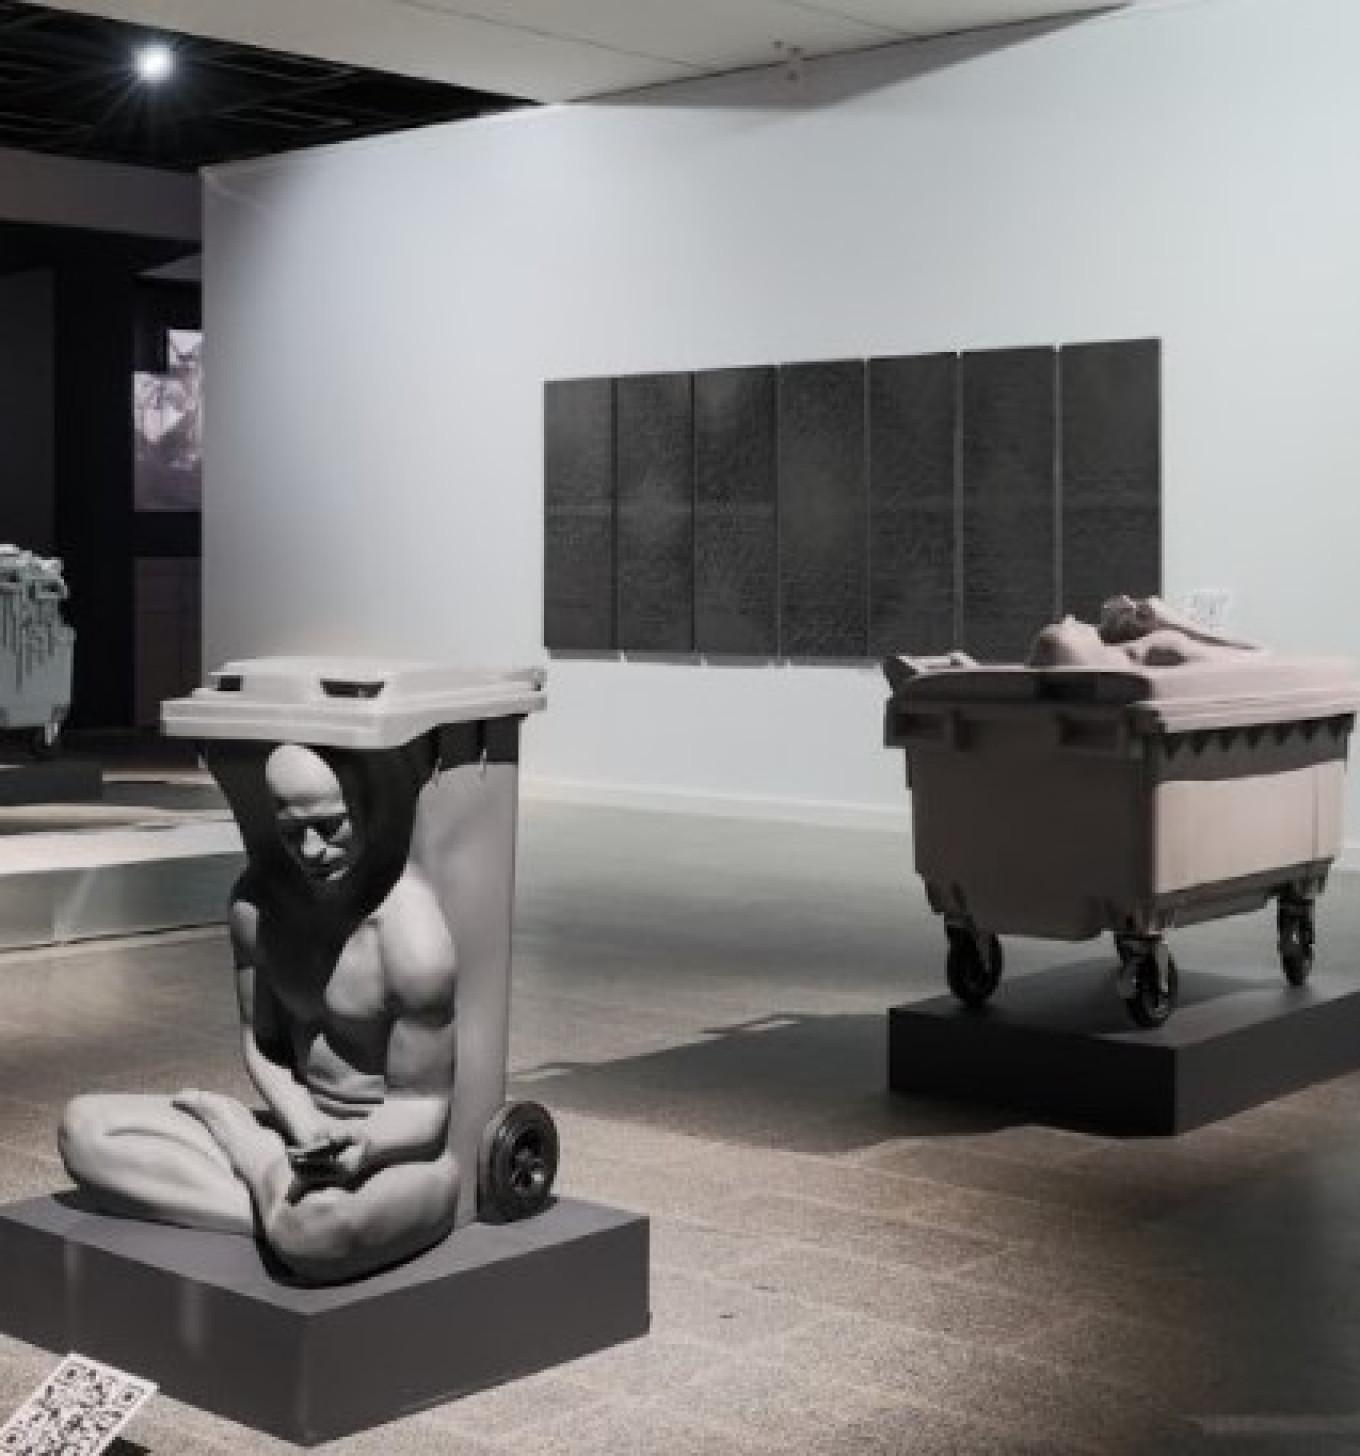 """Sarcophagus,"" Recycle Irina Kolpachnikova / Manege"